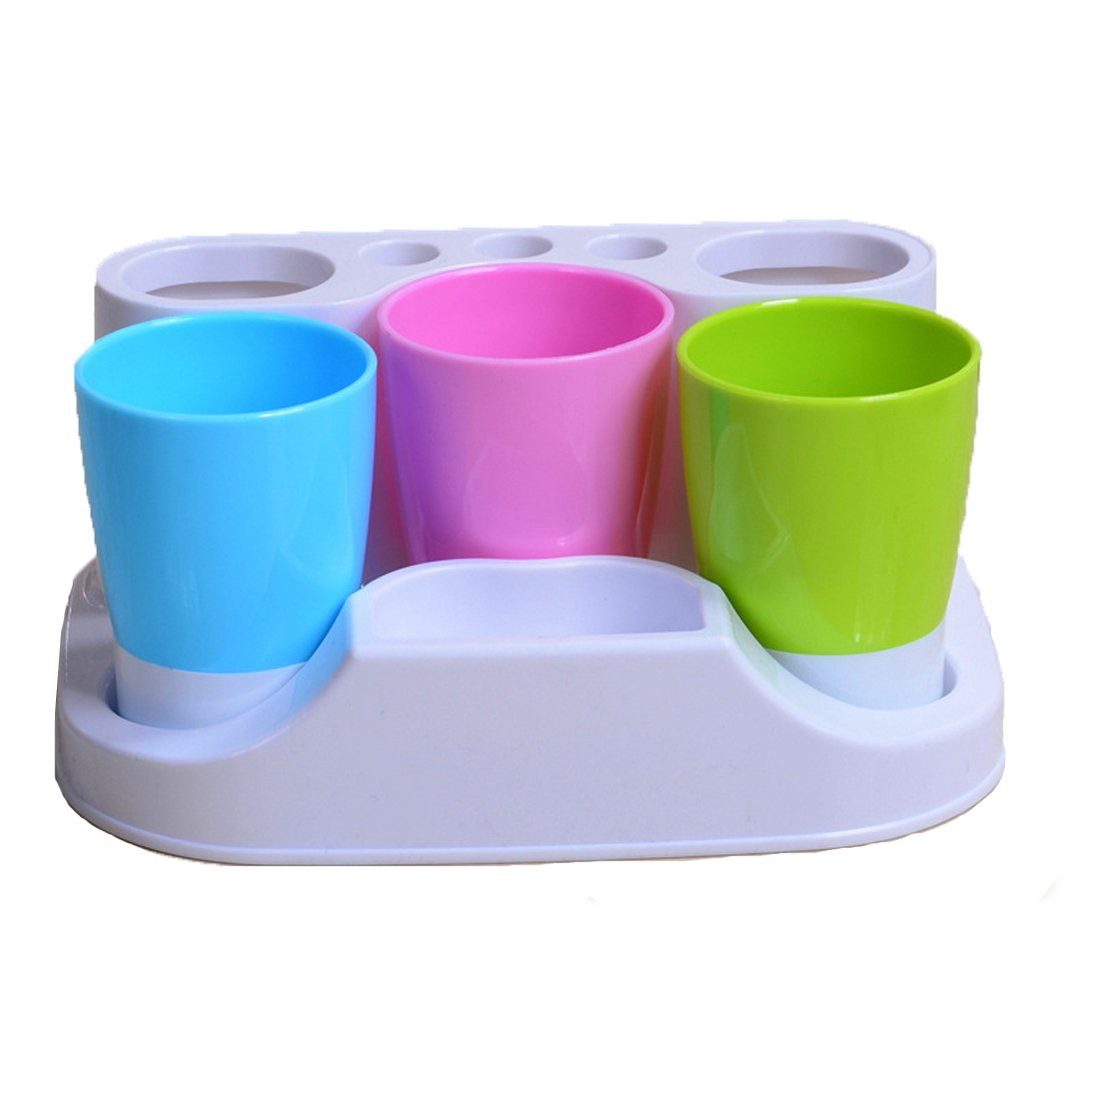 Plastic Bathroom Toothbrush Holders Toothpaste Stand Holders Storage Rack Box Set (3 Stands Toothbrush holder)